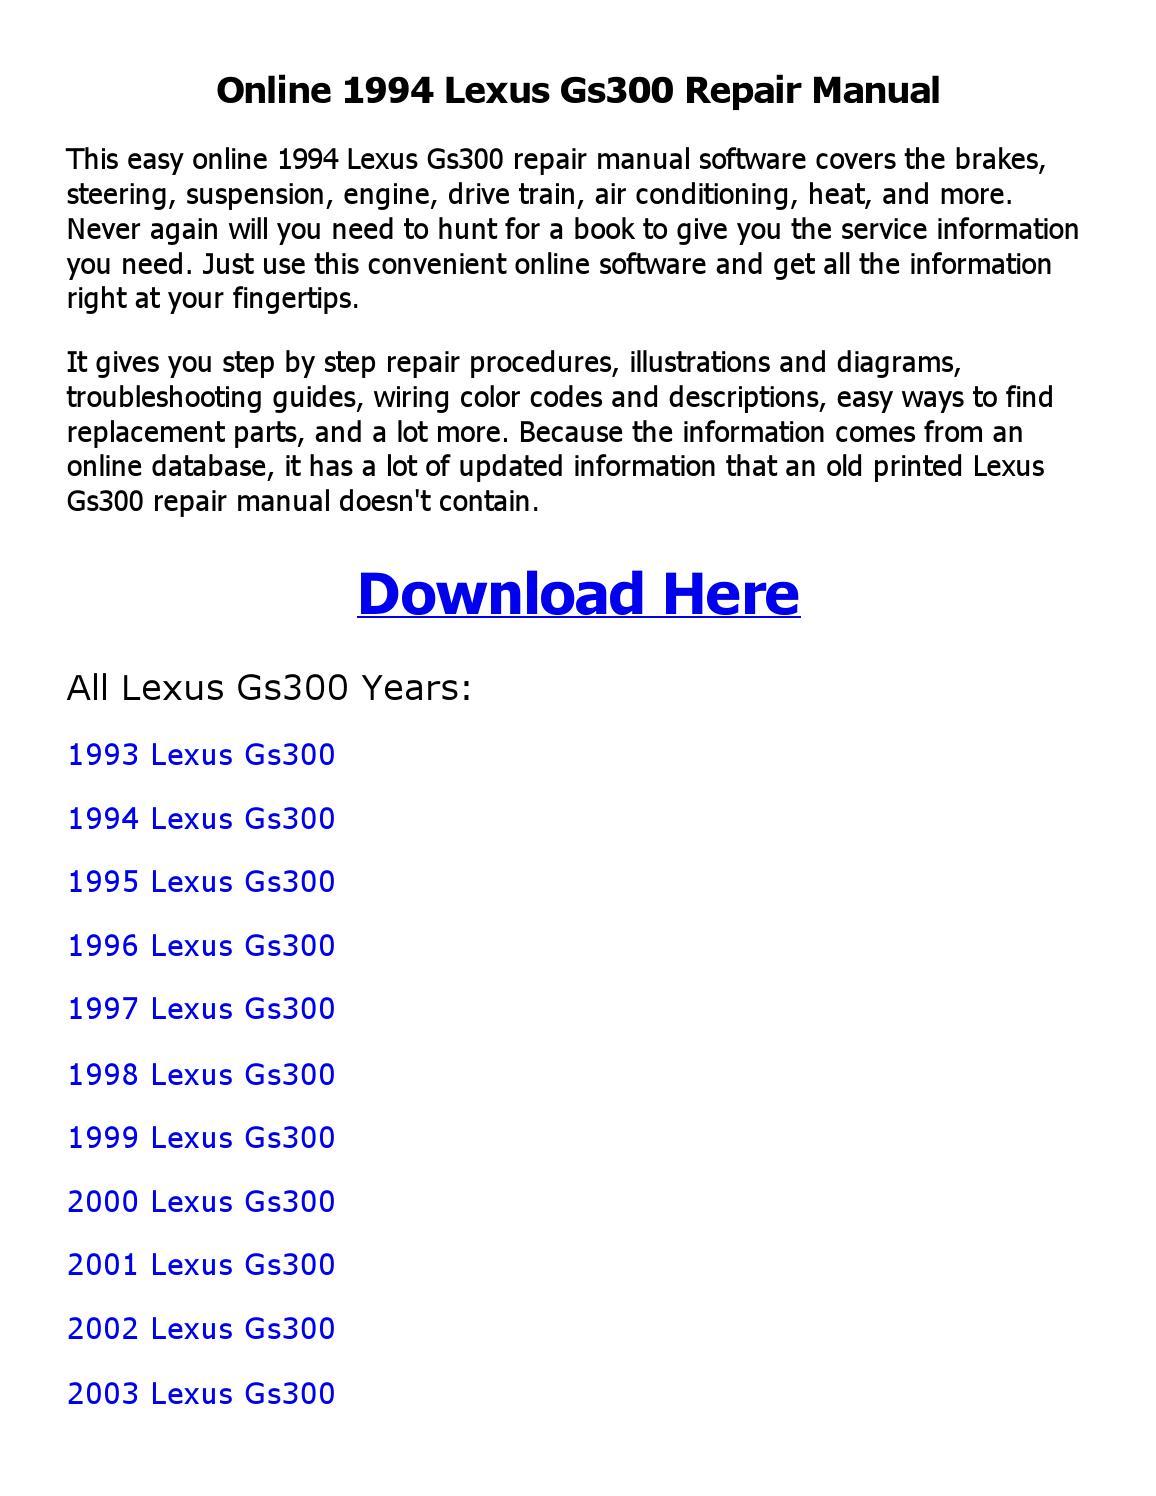 1994 lexus gs300 wiring diagram 1994 lexus gs300 repair manual online by sadi1sdi1 issuu  1994 lexus gs300 repair manual online